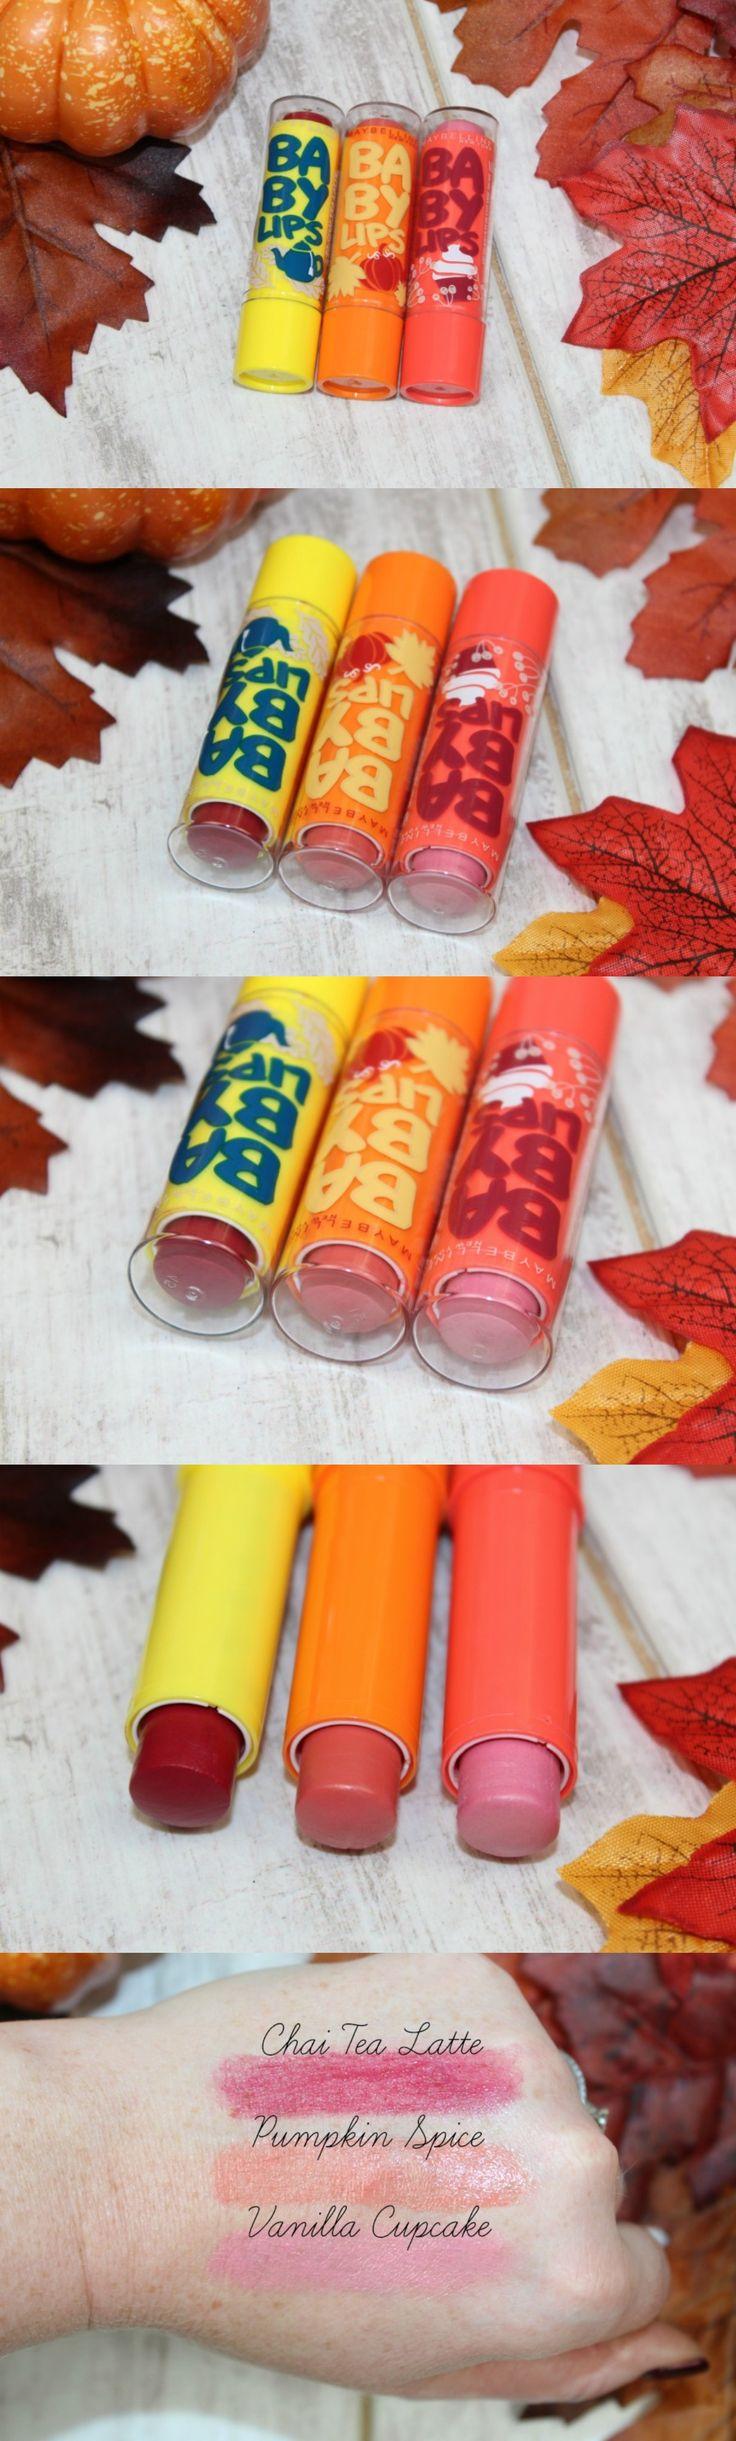 Maybelline Autumn Baby Lips - http://pinkparadisebeauty.blogspot.co.uk/2016/11/maybelline-baby-lips-autumn-editions.html